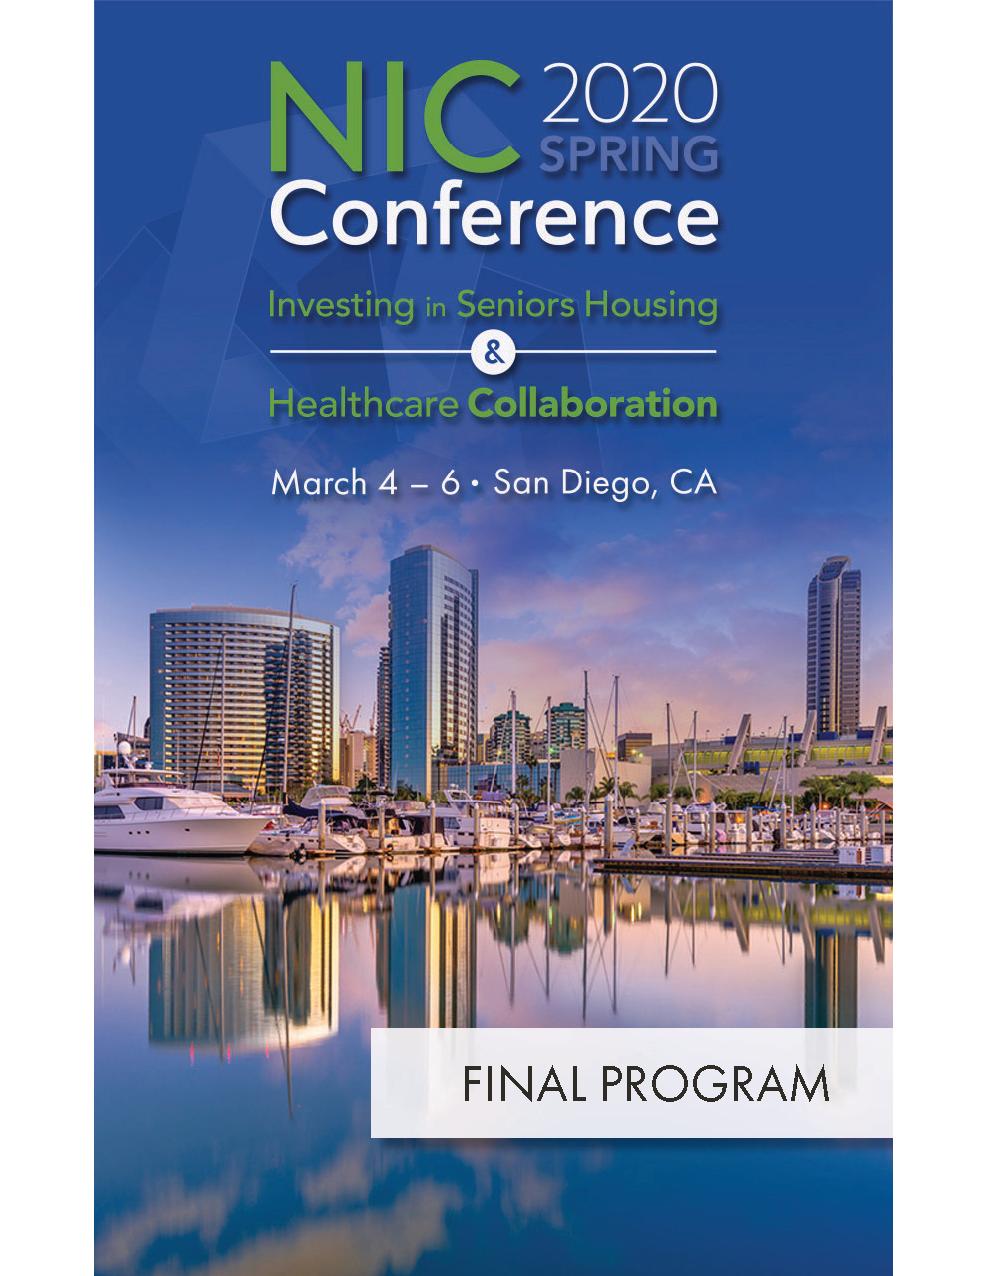 NIC_Spring2020_FinalProgram Cover